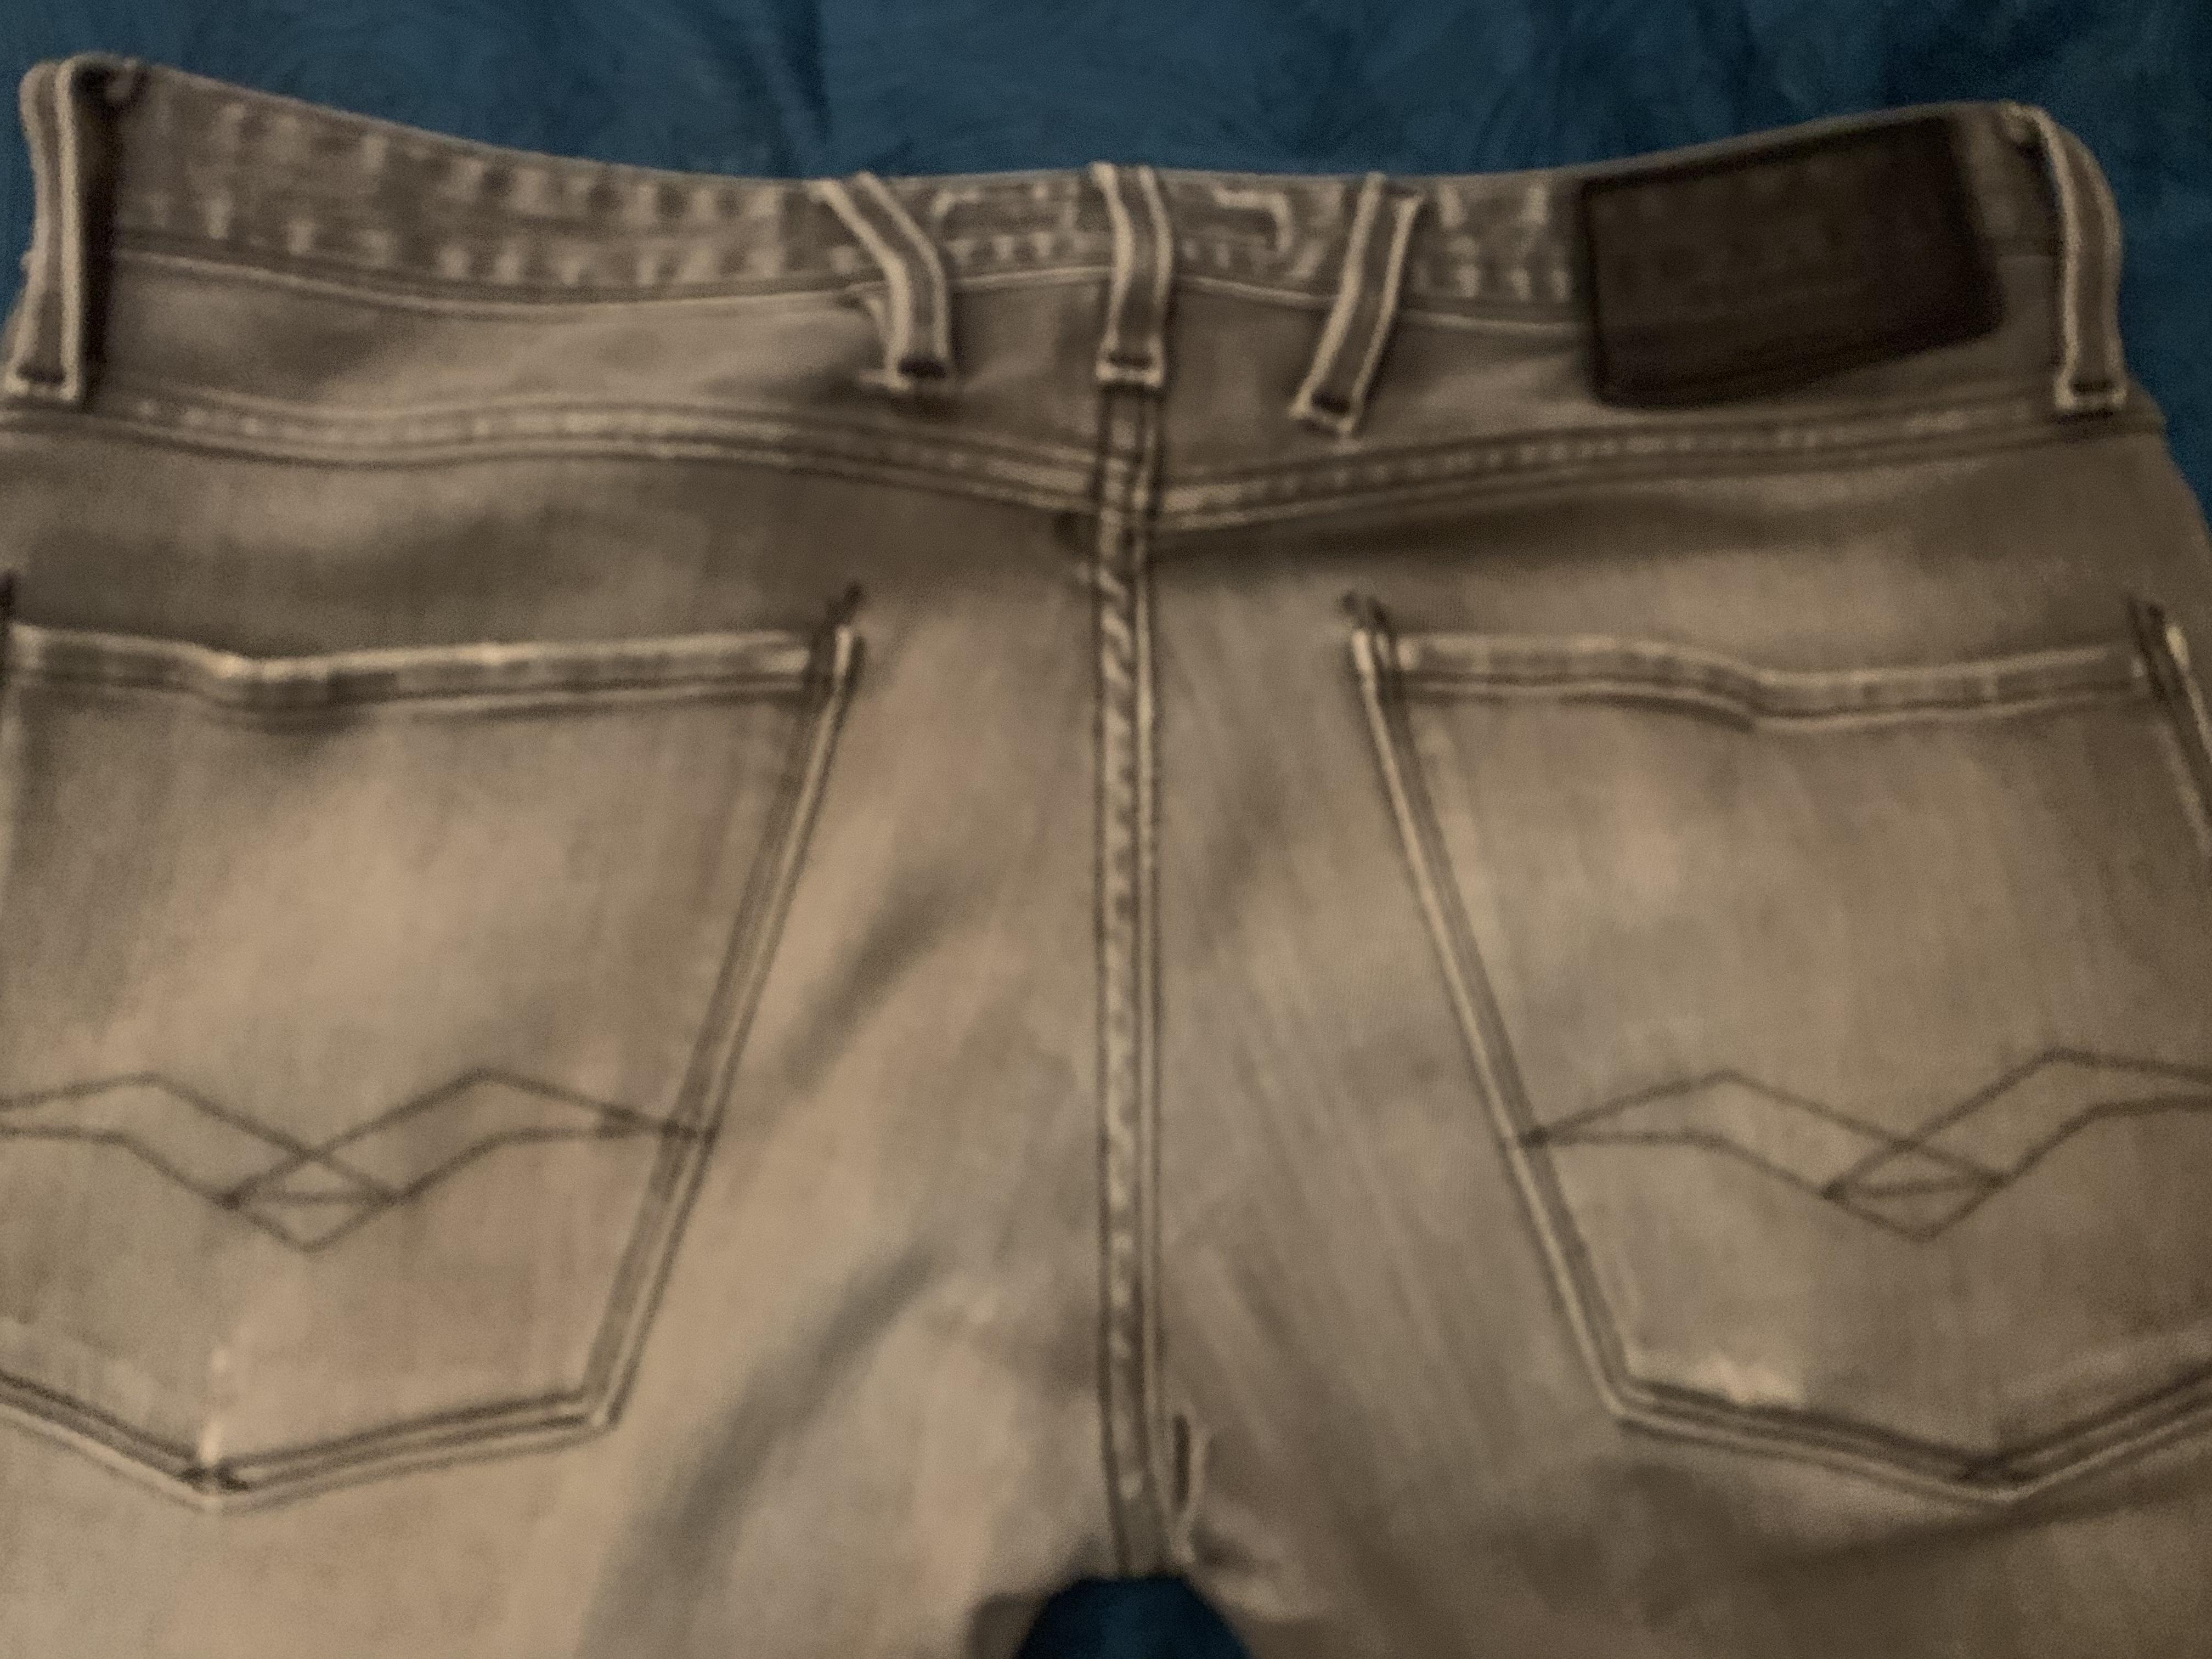 Replay: Hose reißt im Schritt nach nicht mal 4 Monaten